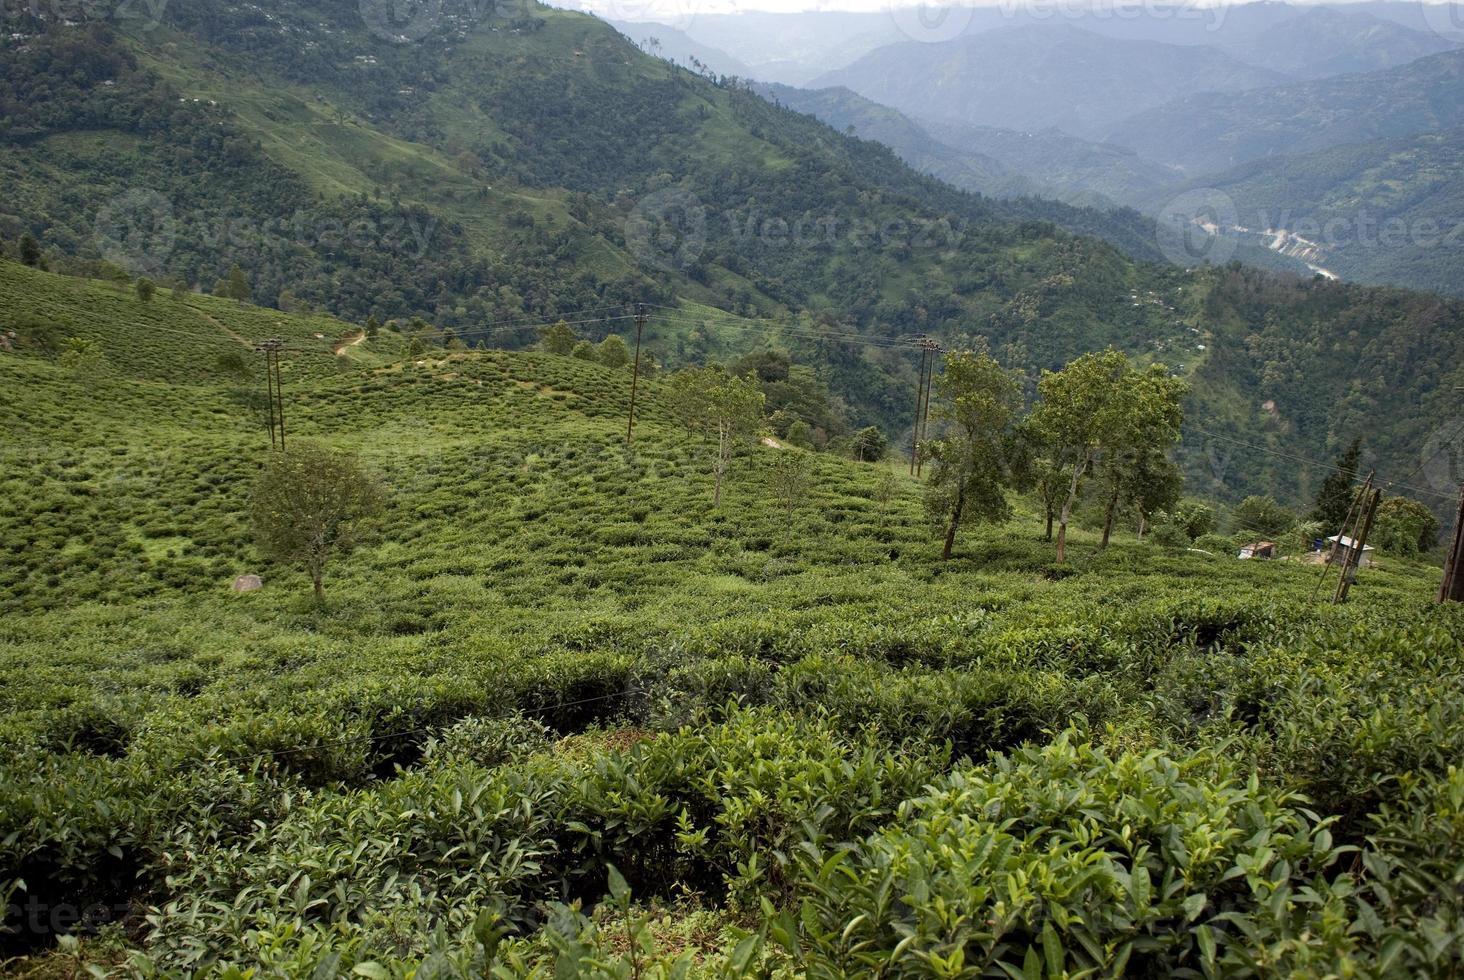 jardim de chá, bengala ocidental, índia foto